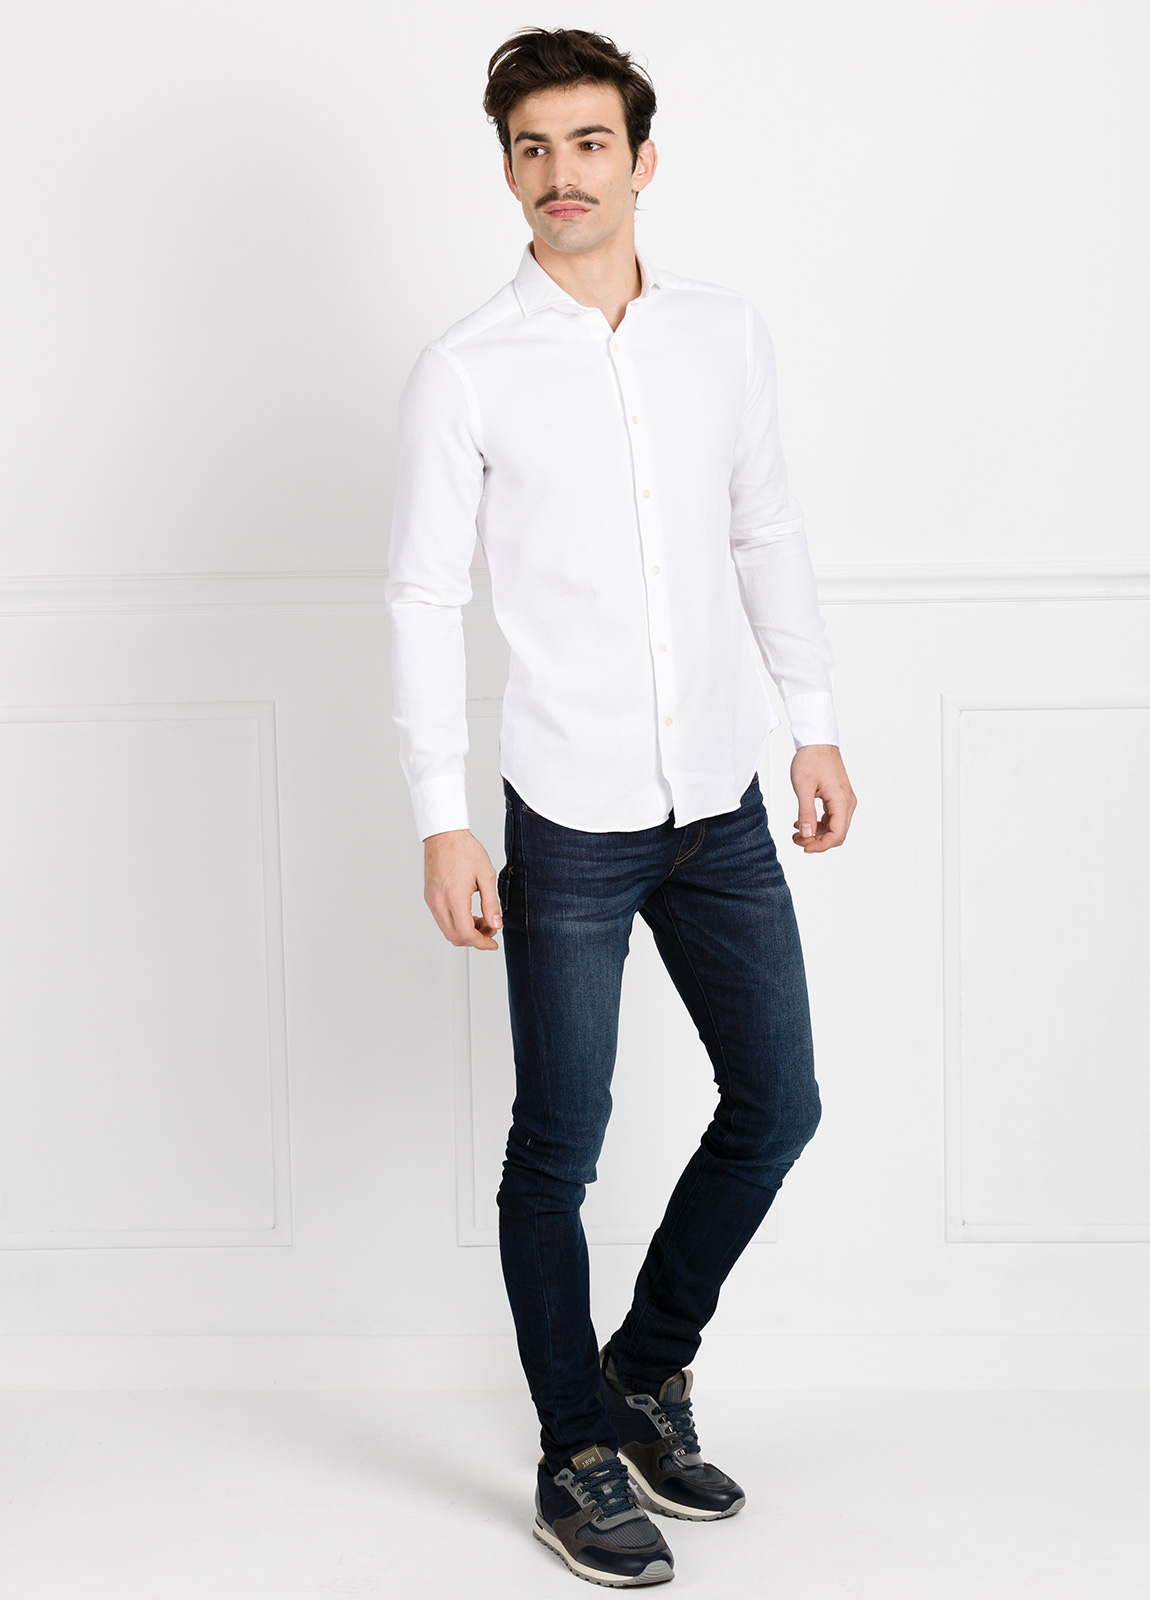 Camisa Leisure Wear SLIM FIT Modelo CAPRI color blanco nido de abeja. 100% Algodón.